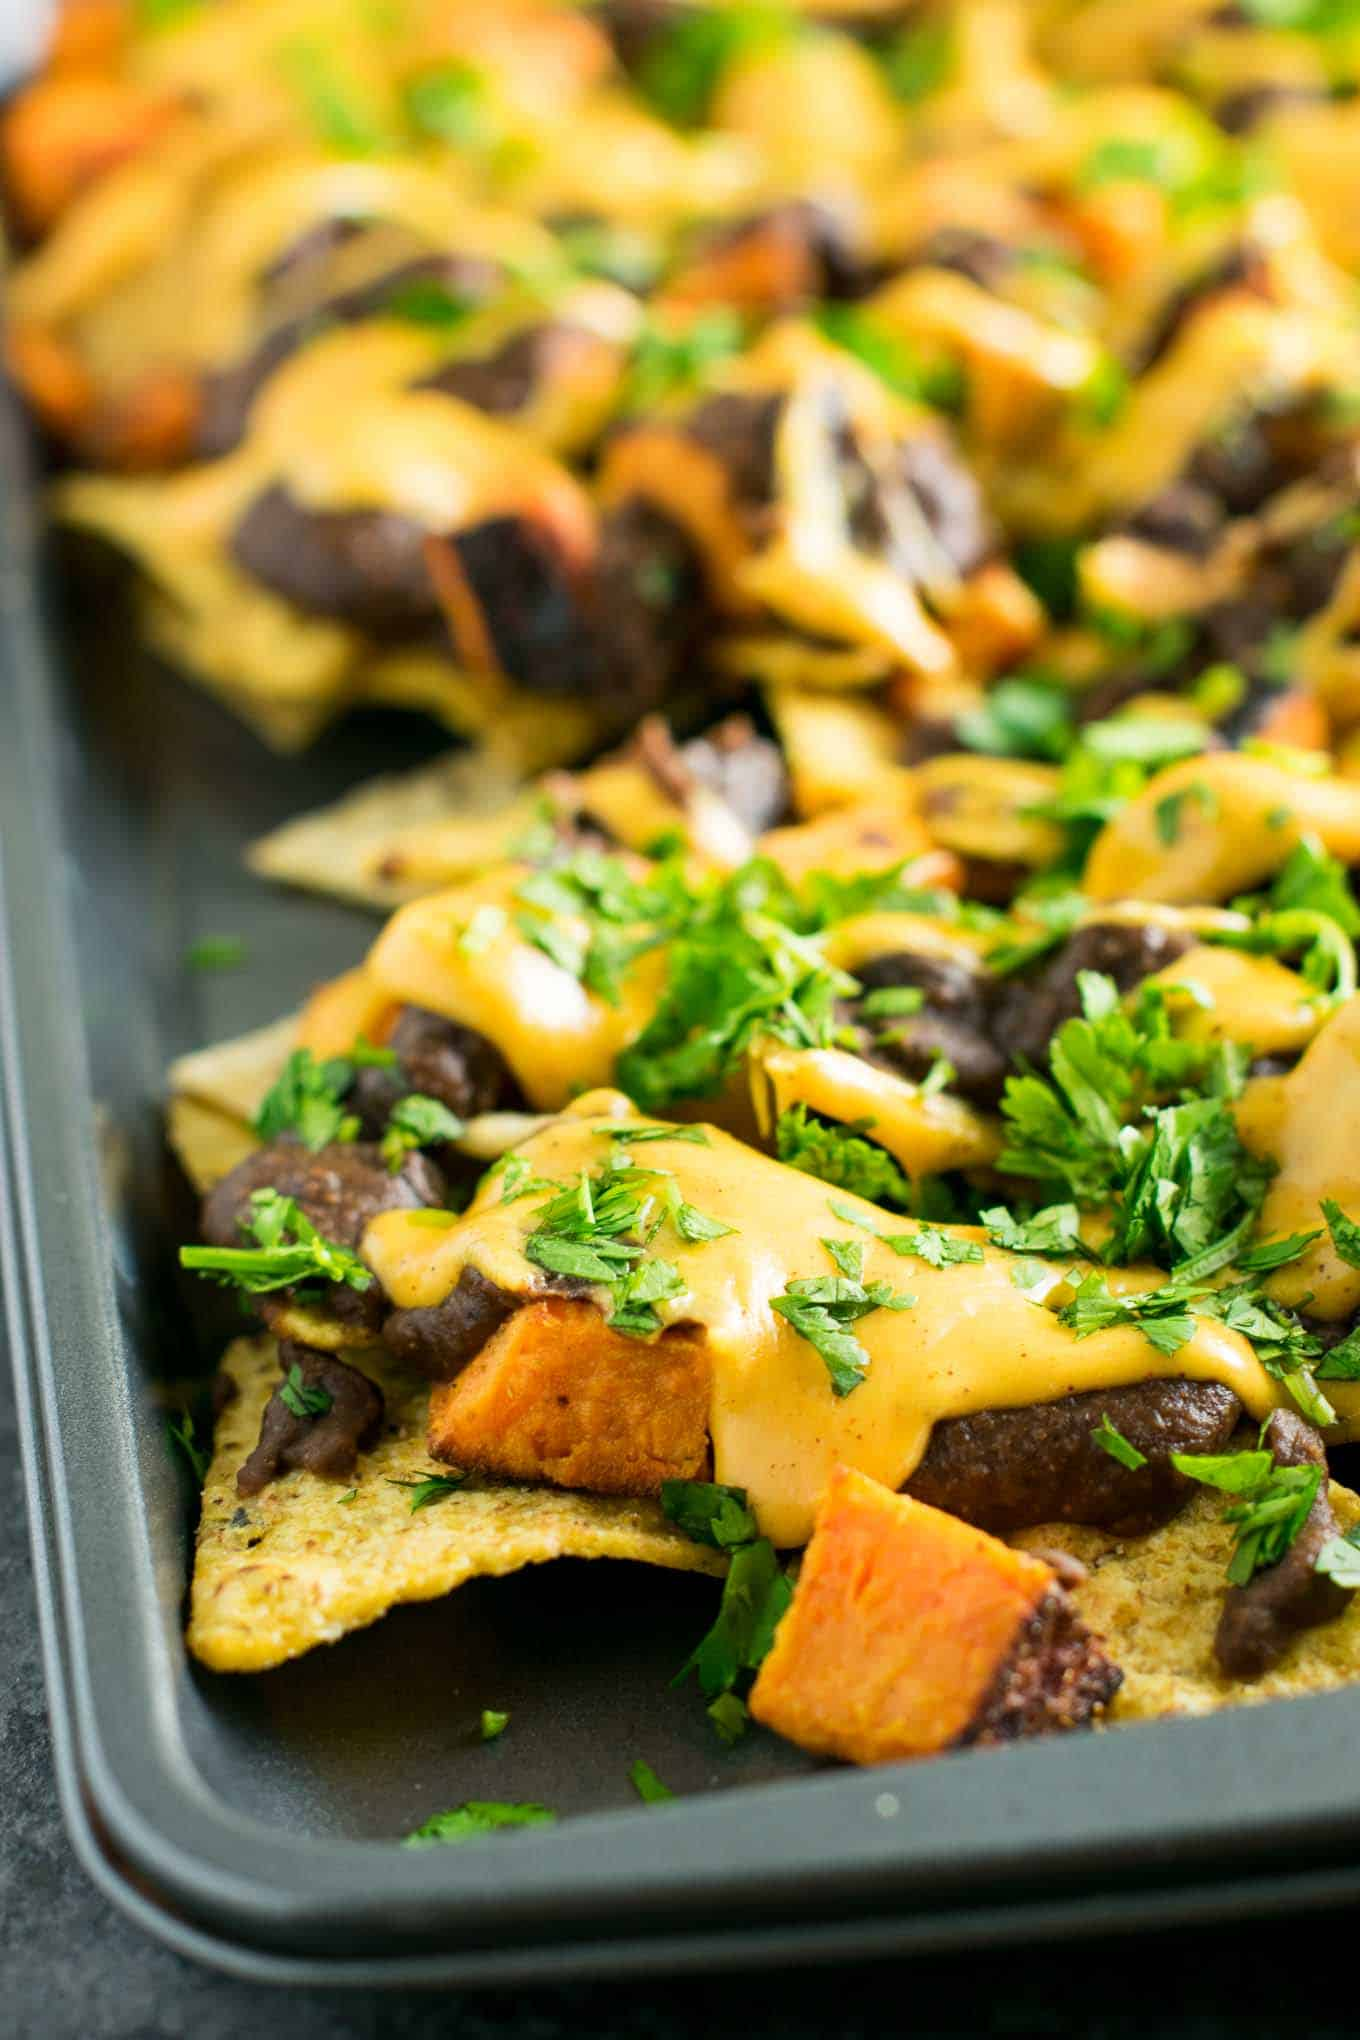 30 Minute Sweet Potato Refried Bean Nachos - recipe via @buildyourbite